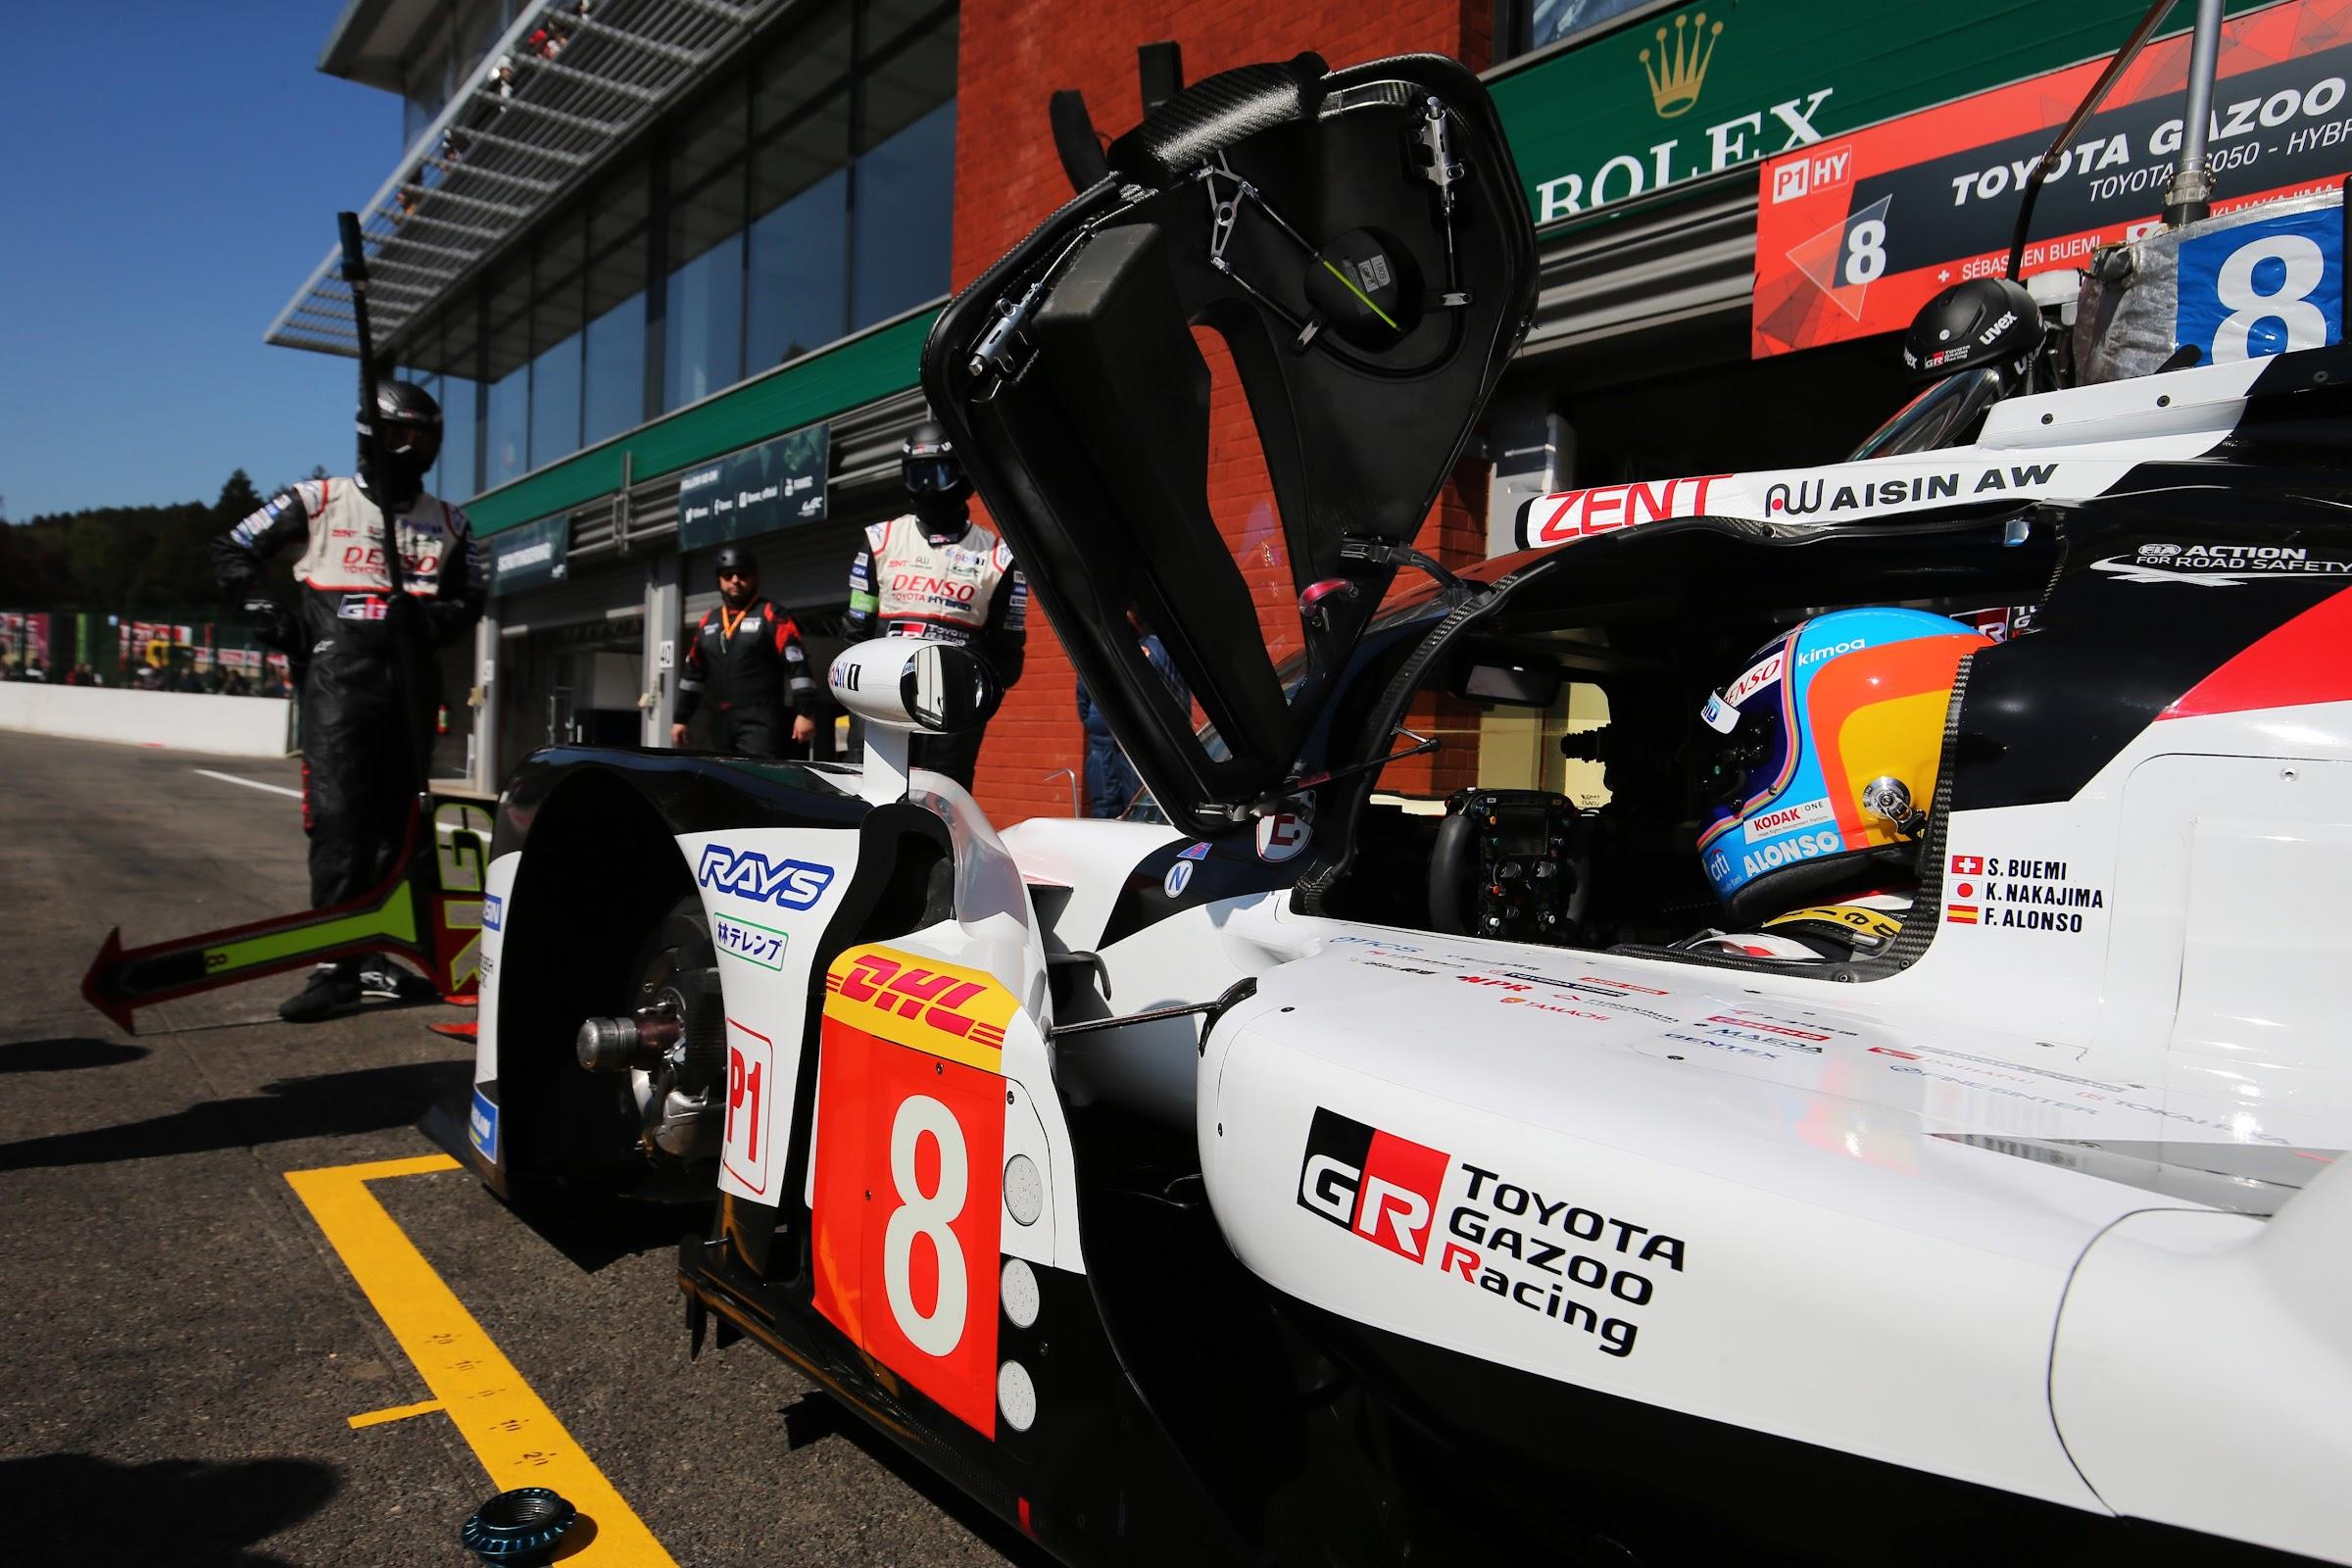 KZ2lCfAsBSJDFDrNZVtW7IpHEOh3hLHd0tZMrH06v6vKUFyZHsxJZSknNkmUIk67Y6pNTY18SZ00GLKdTMKsJ0JWHnQFuO5HkjbrOEHIAxdp2T0gneW wJbQszY16i7lNMBxrmuz0w=w2400 - Victoria para Alonso y doblete de Toyota en Spa-Francorchamps